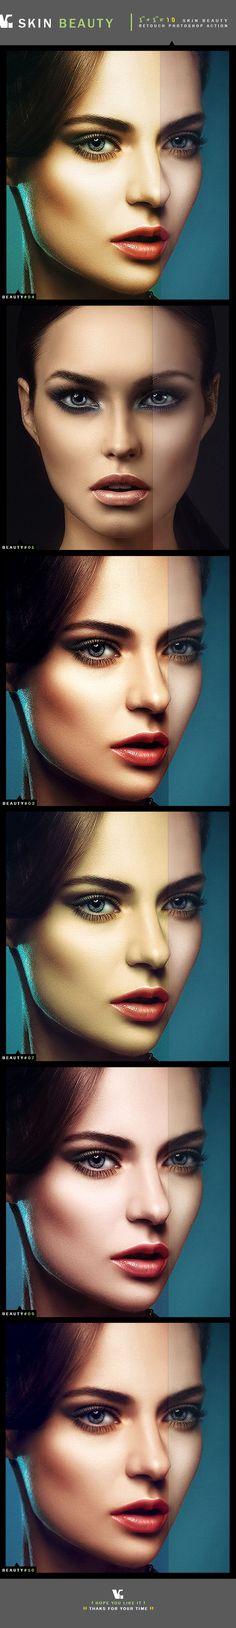 10 Skin Beauty Photoshop Action